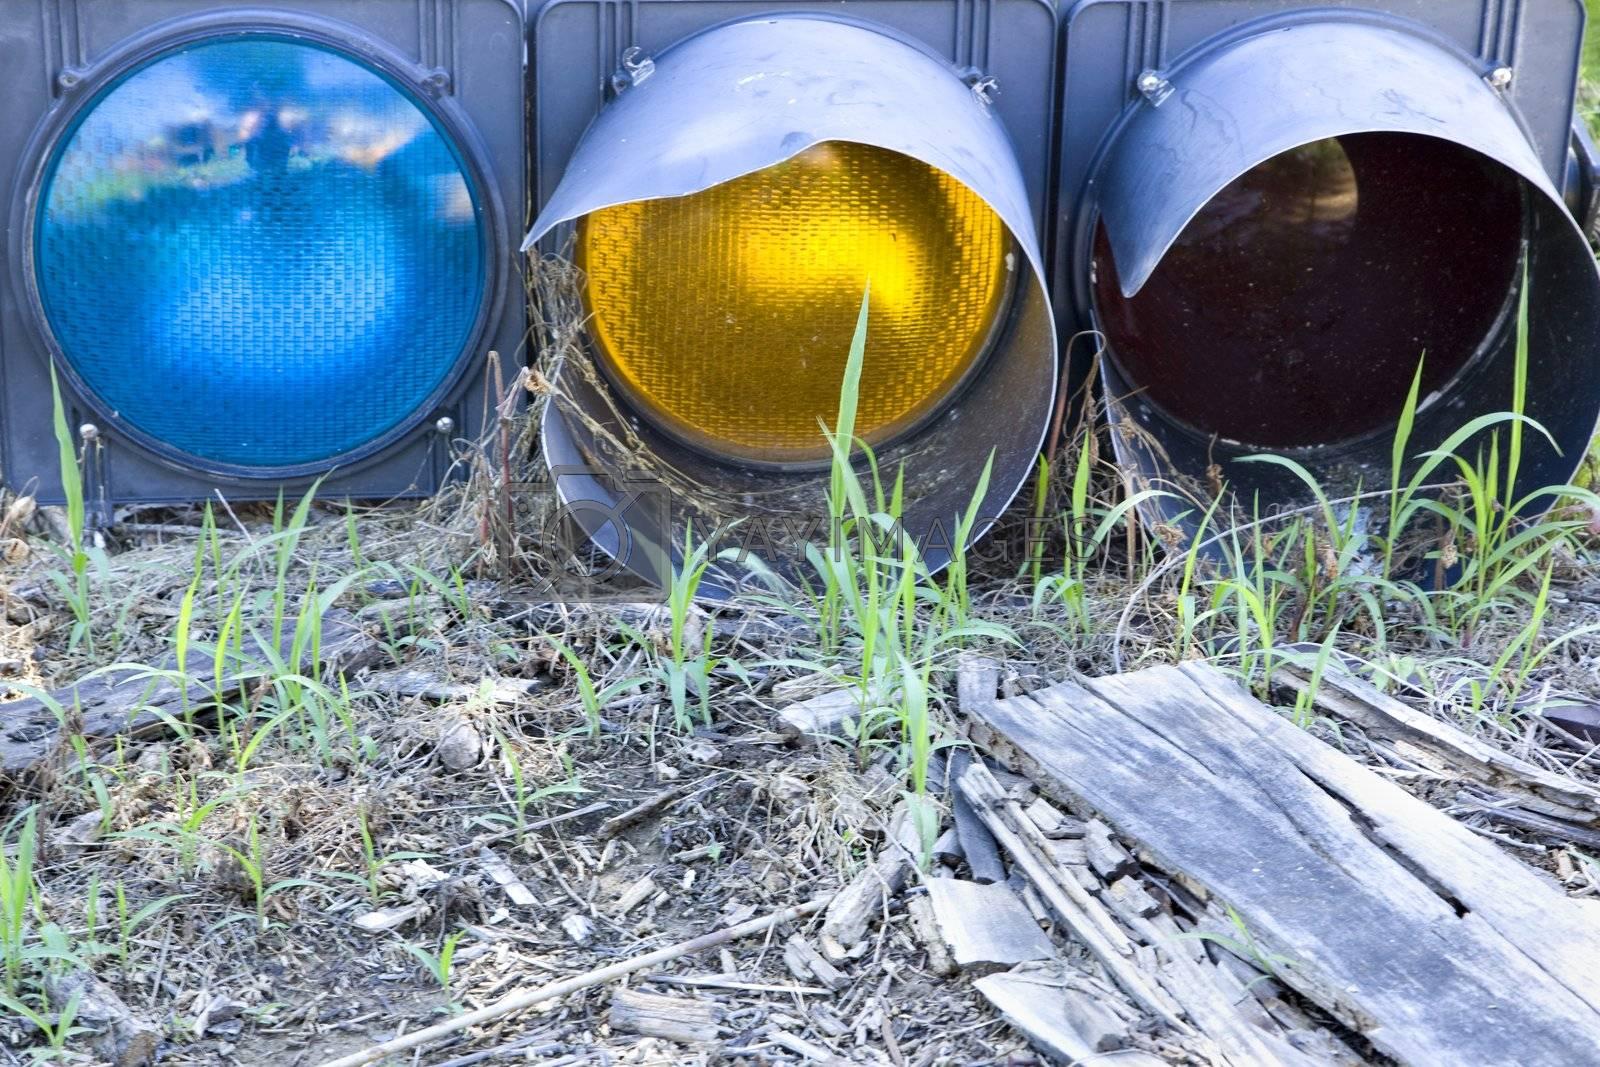 Old traffic light on ground.